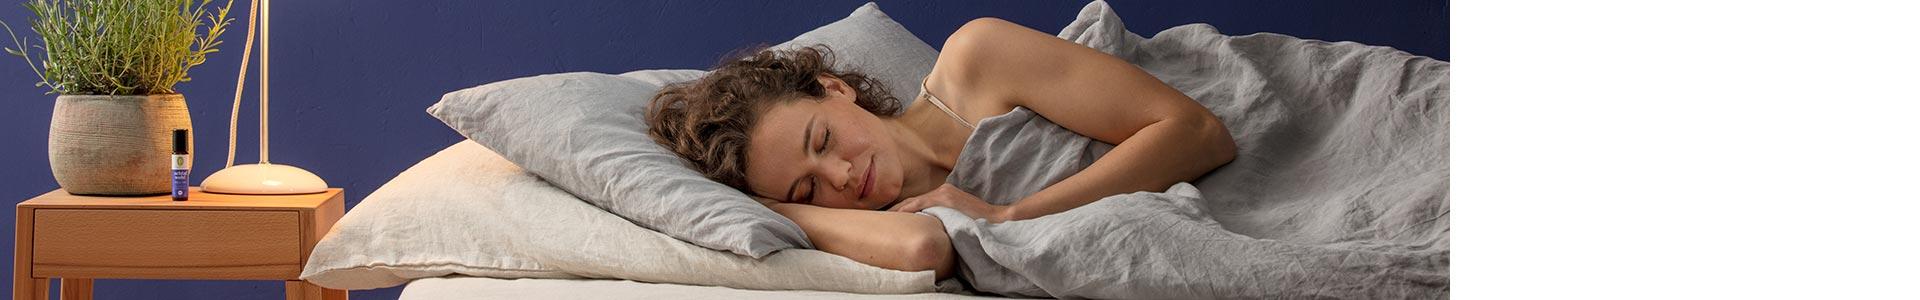 PRIMAVERA Schlafwohl